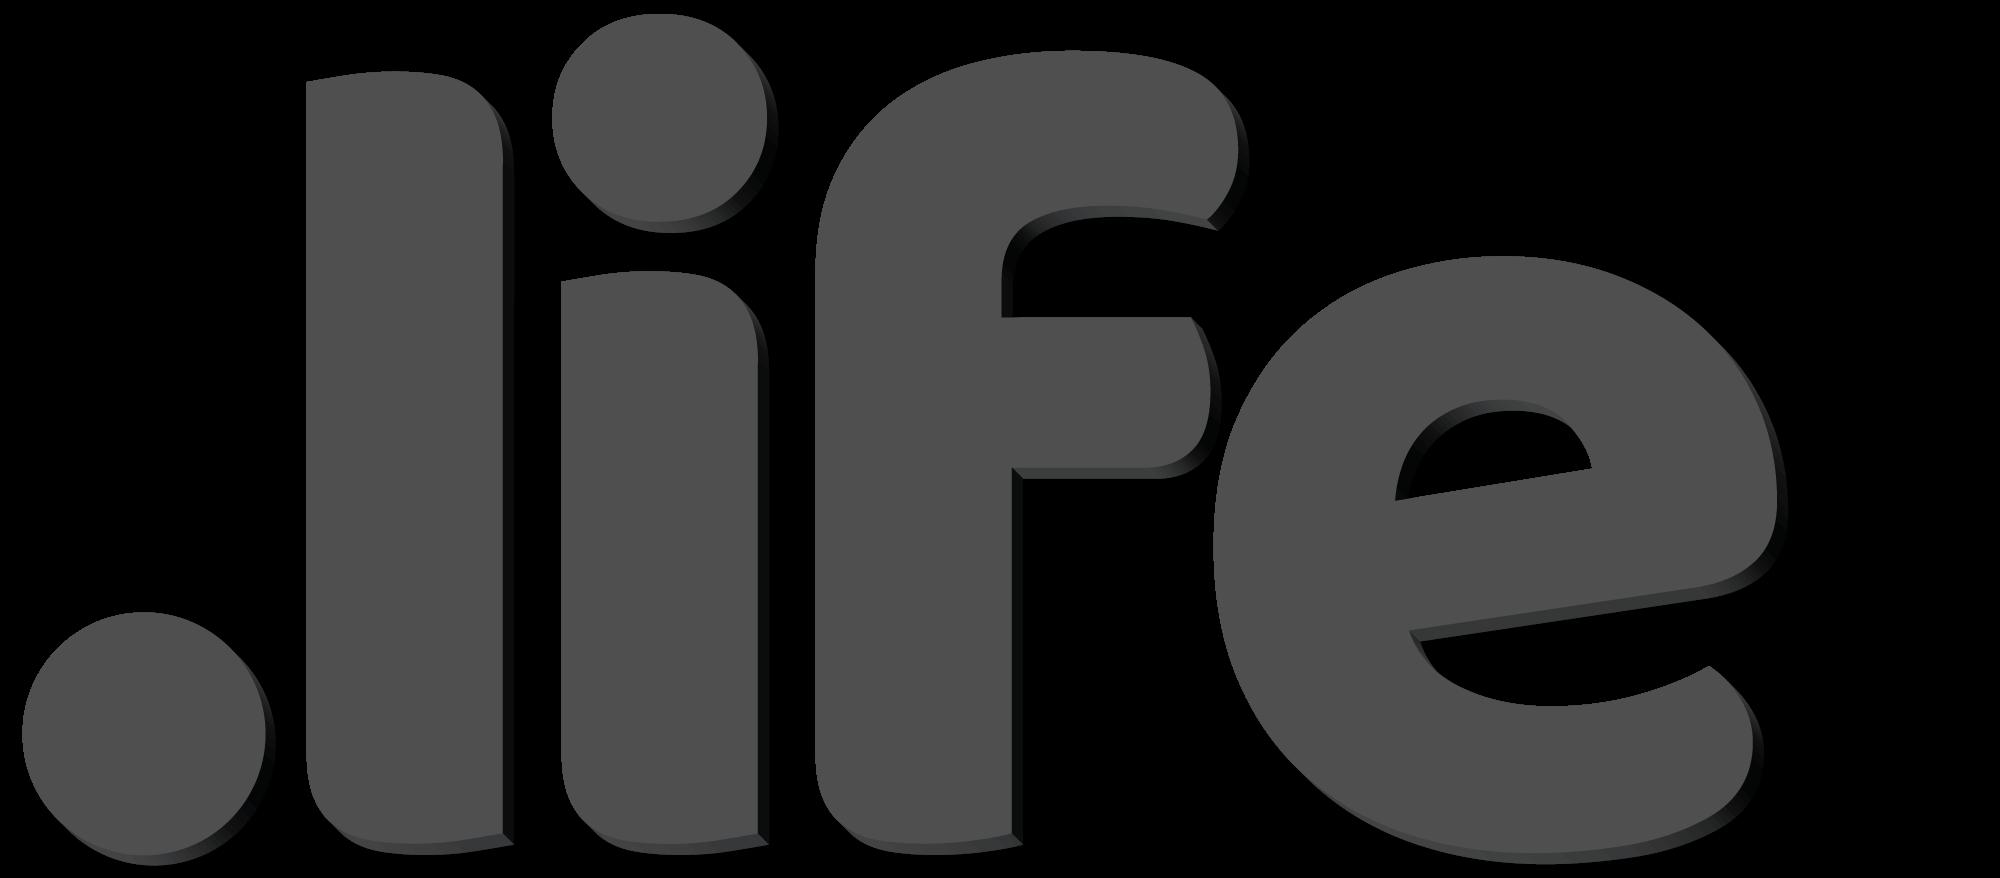 .life domain